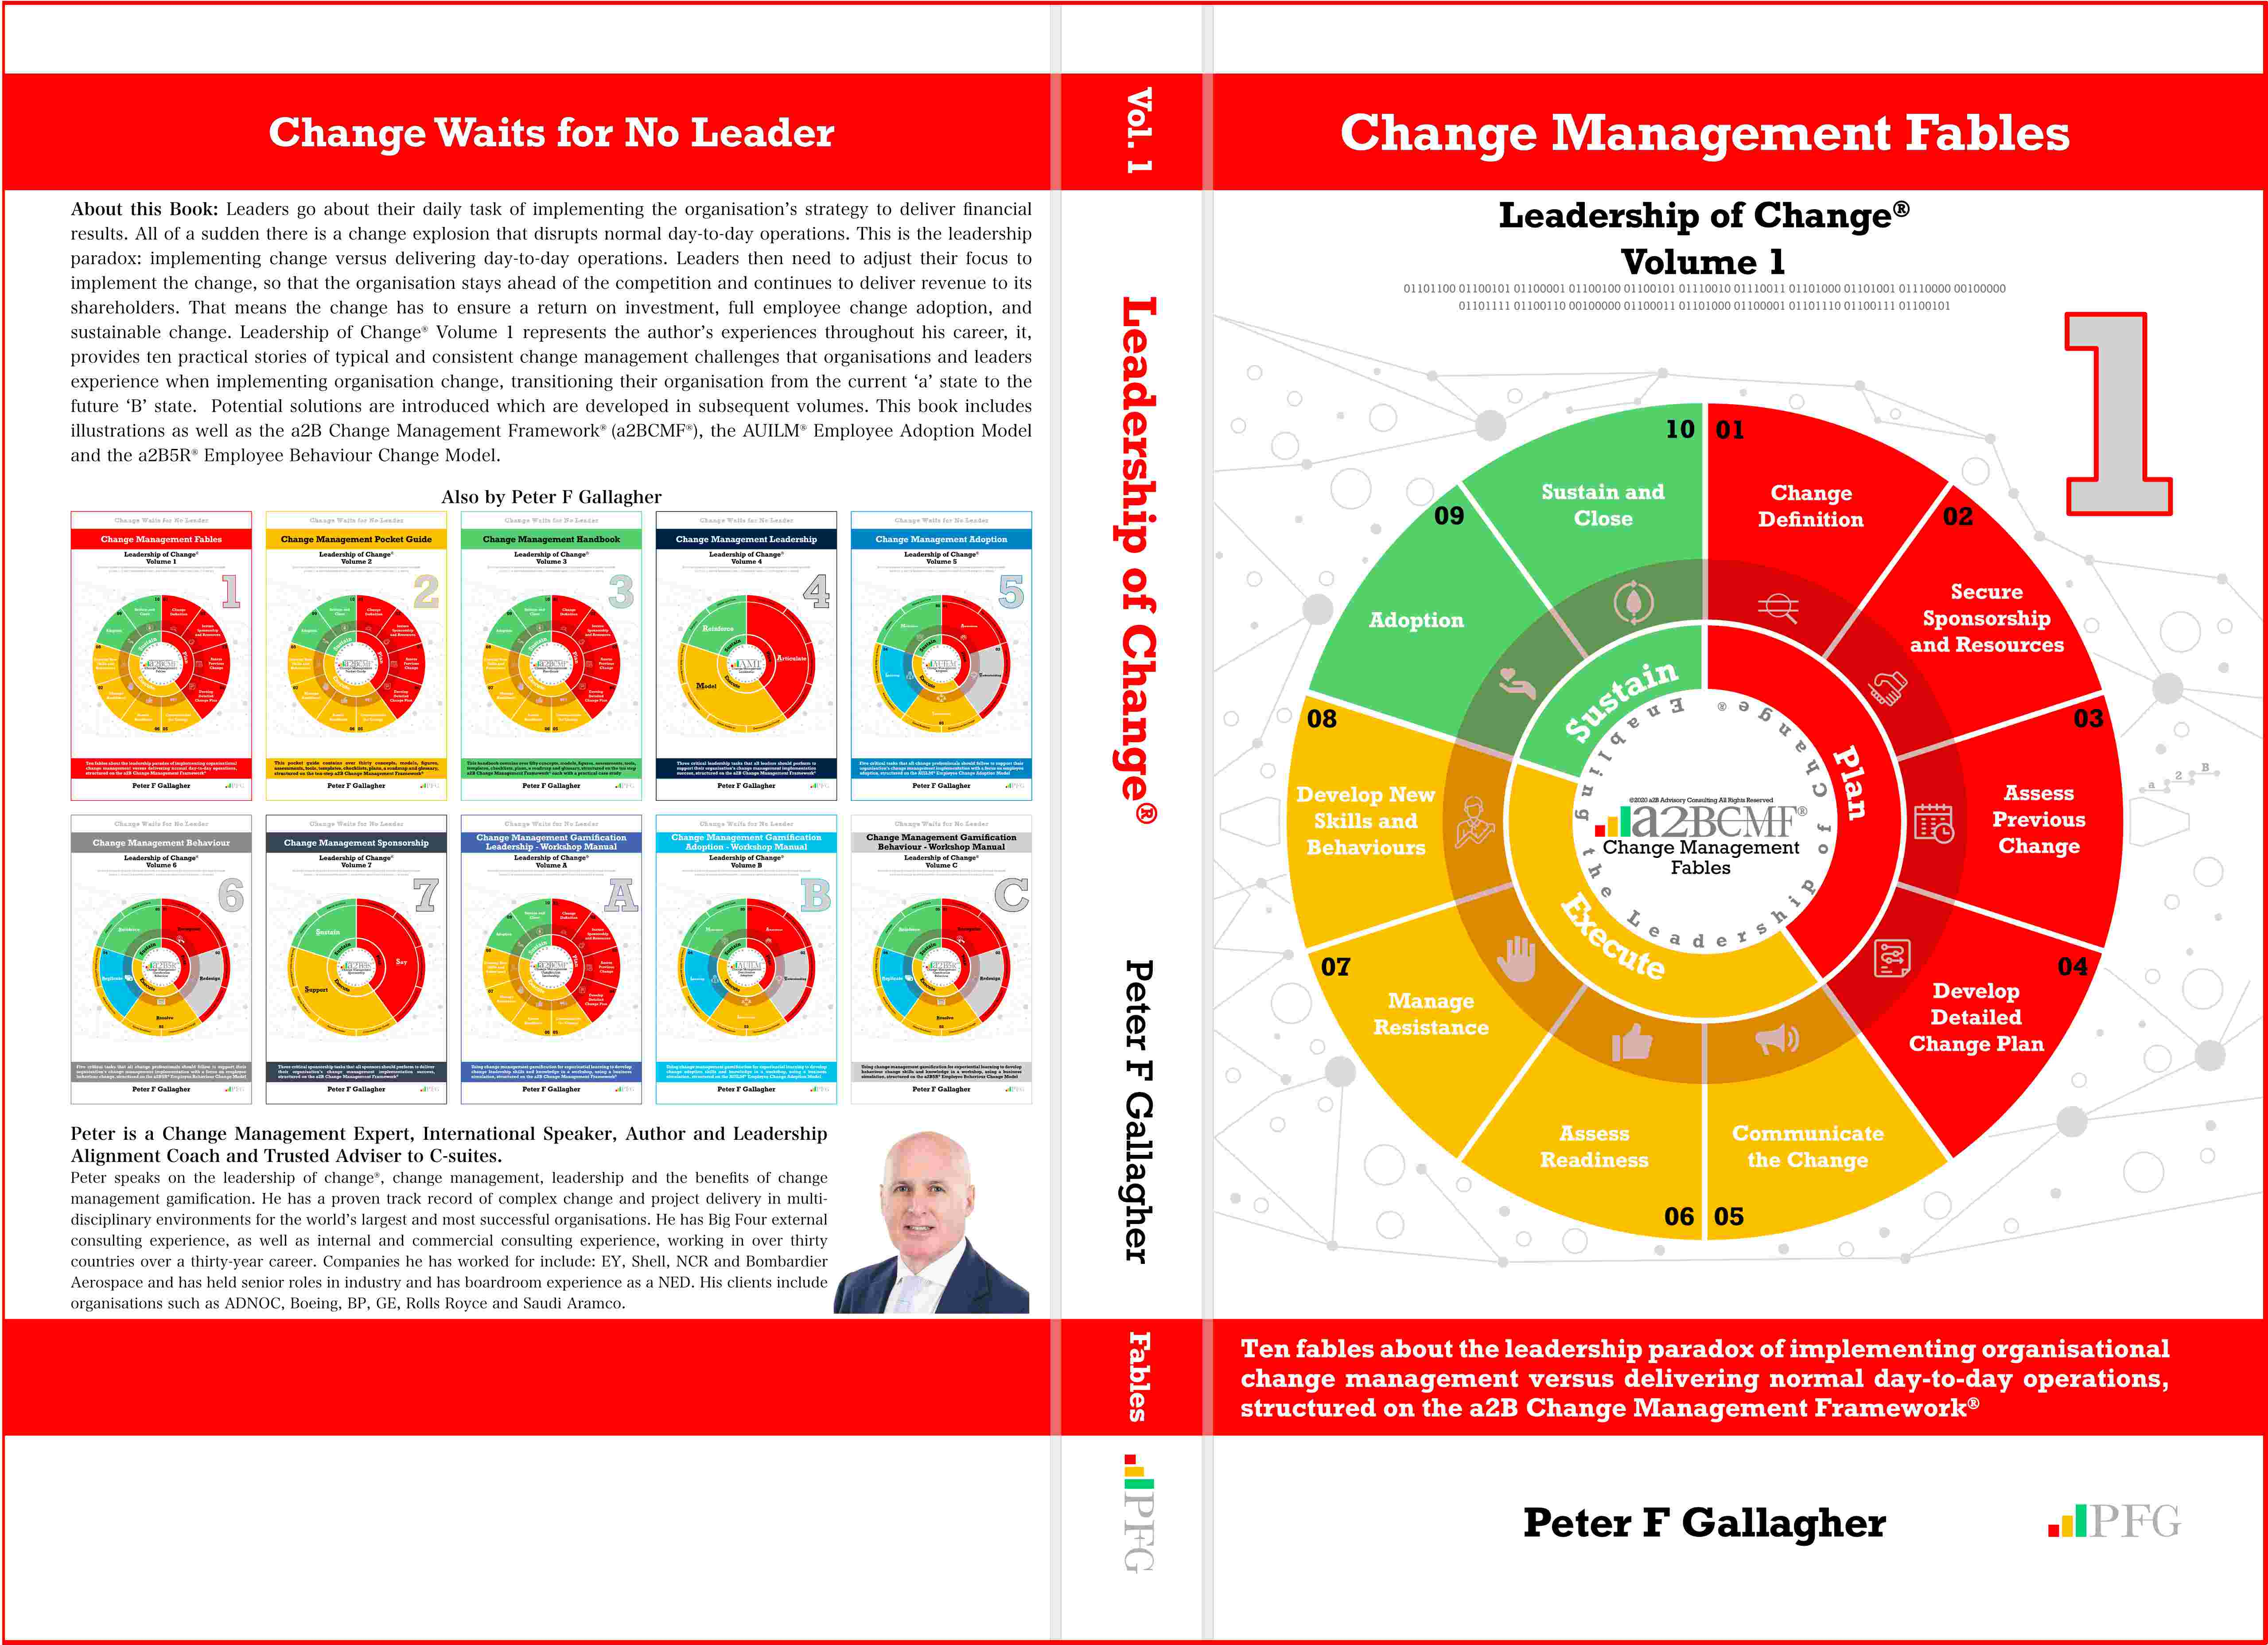 Change Management Fables, Change Management Book, Change Management Books, Change Management Fables